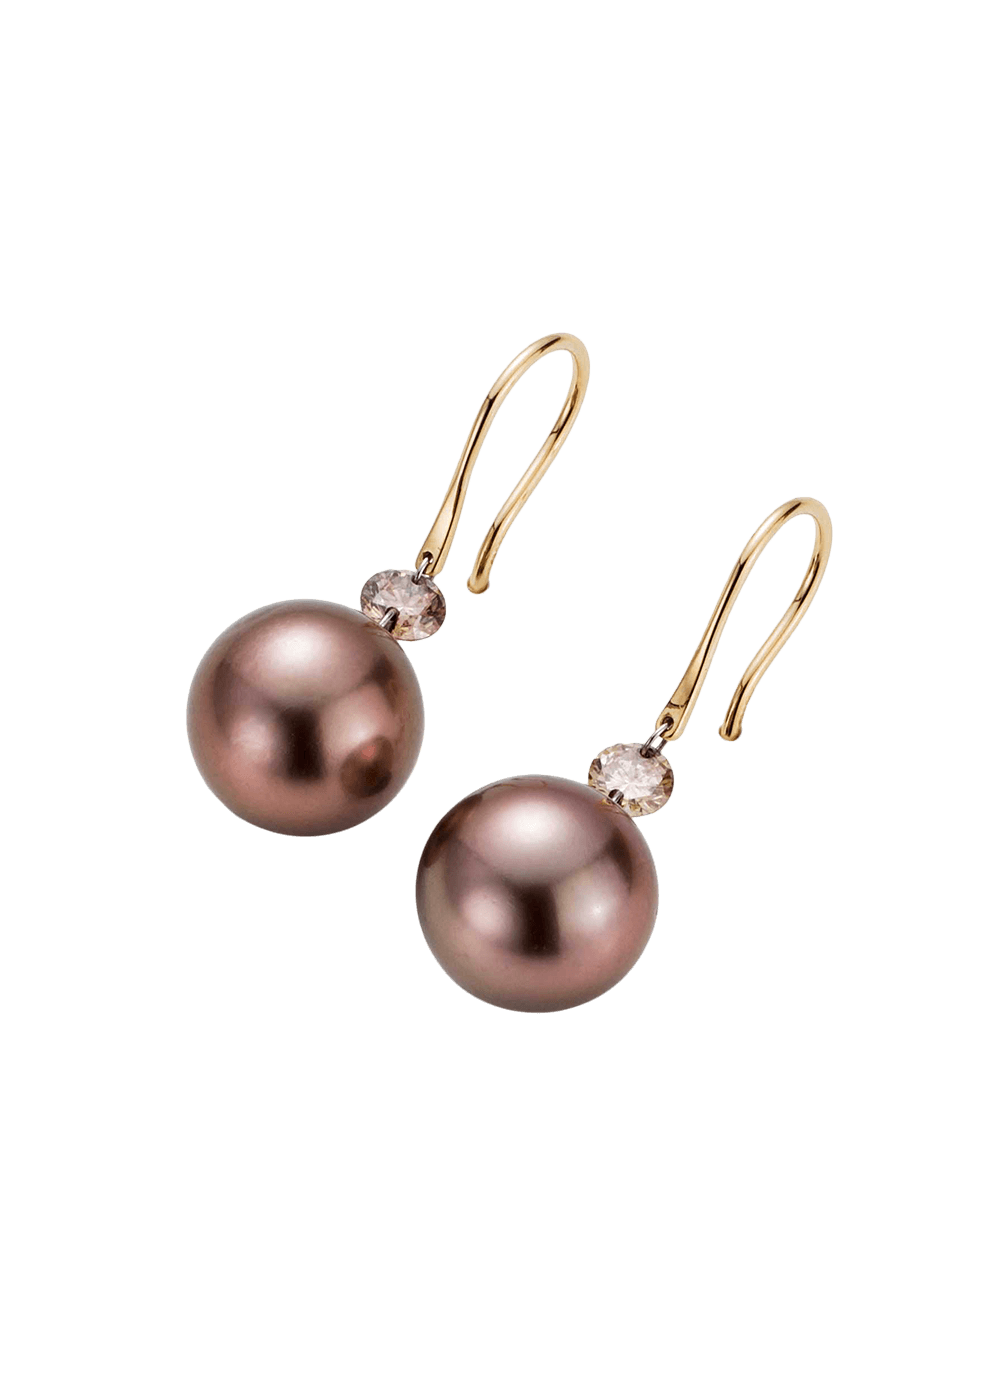 Gellner Perlen Ohrringe